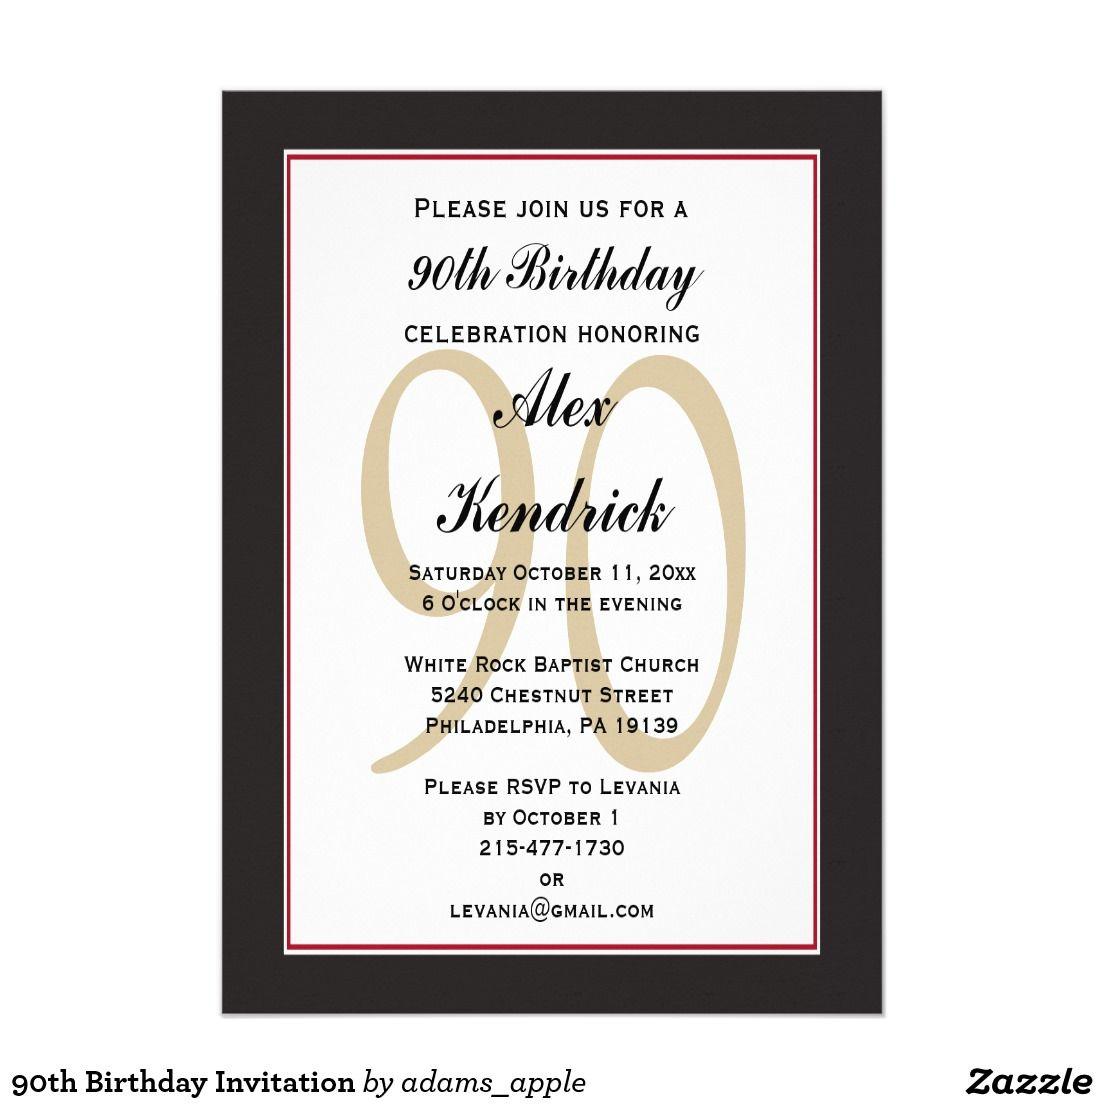 90th Birthday Invitation | BIRTHDAY PARTY INVITATIONS FOR MEN ...